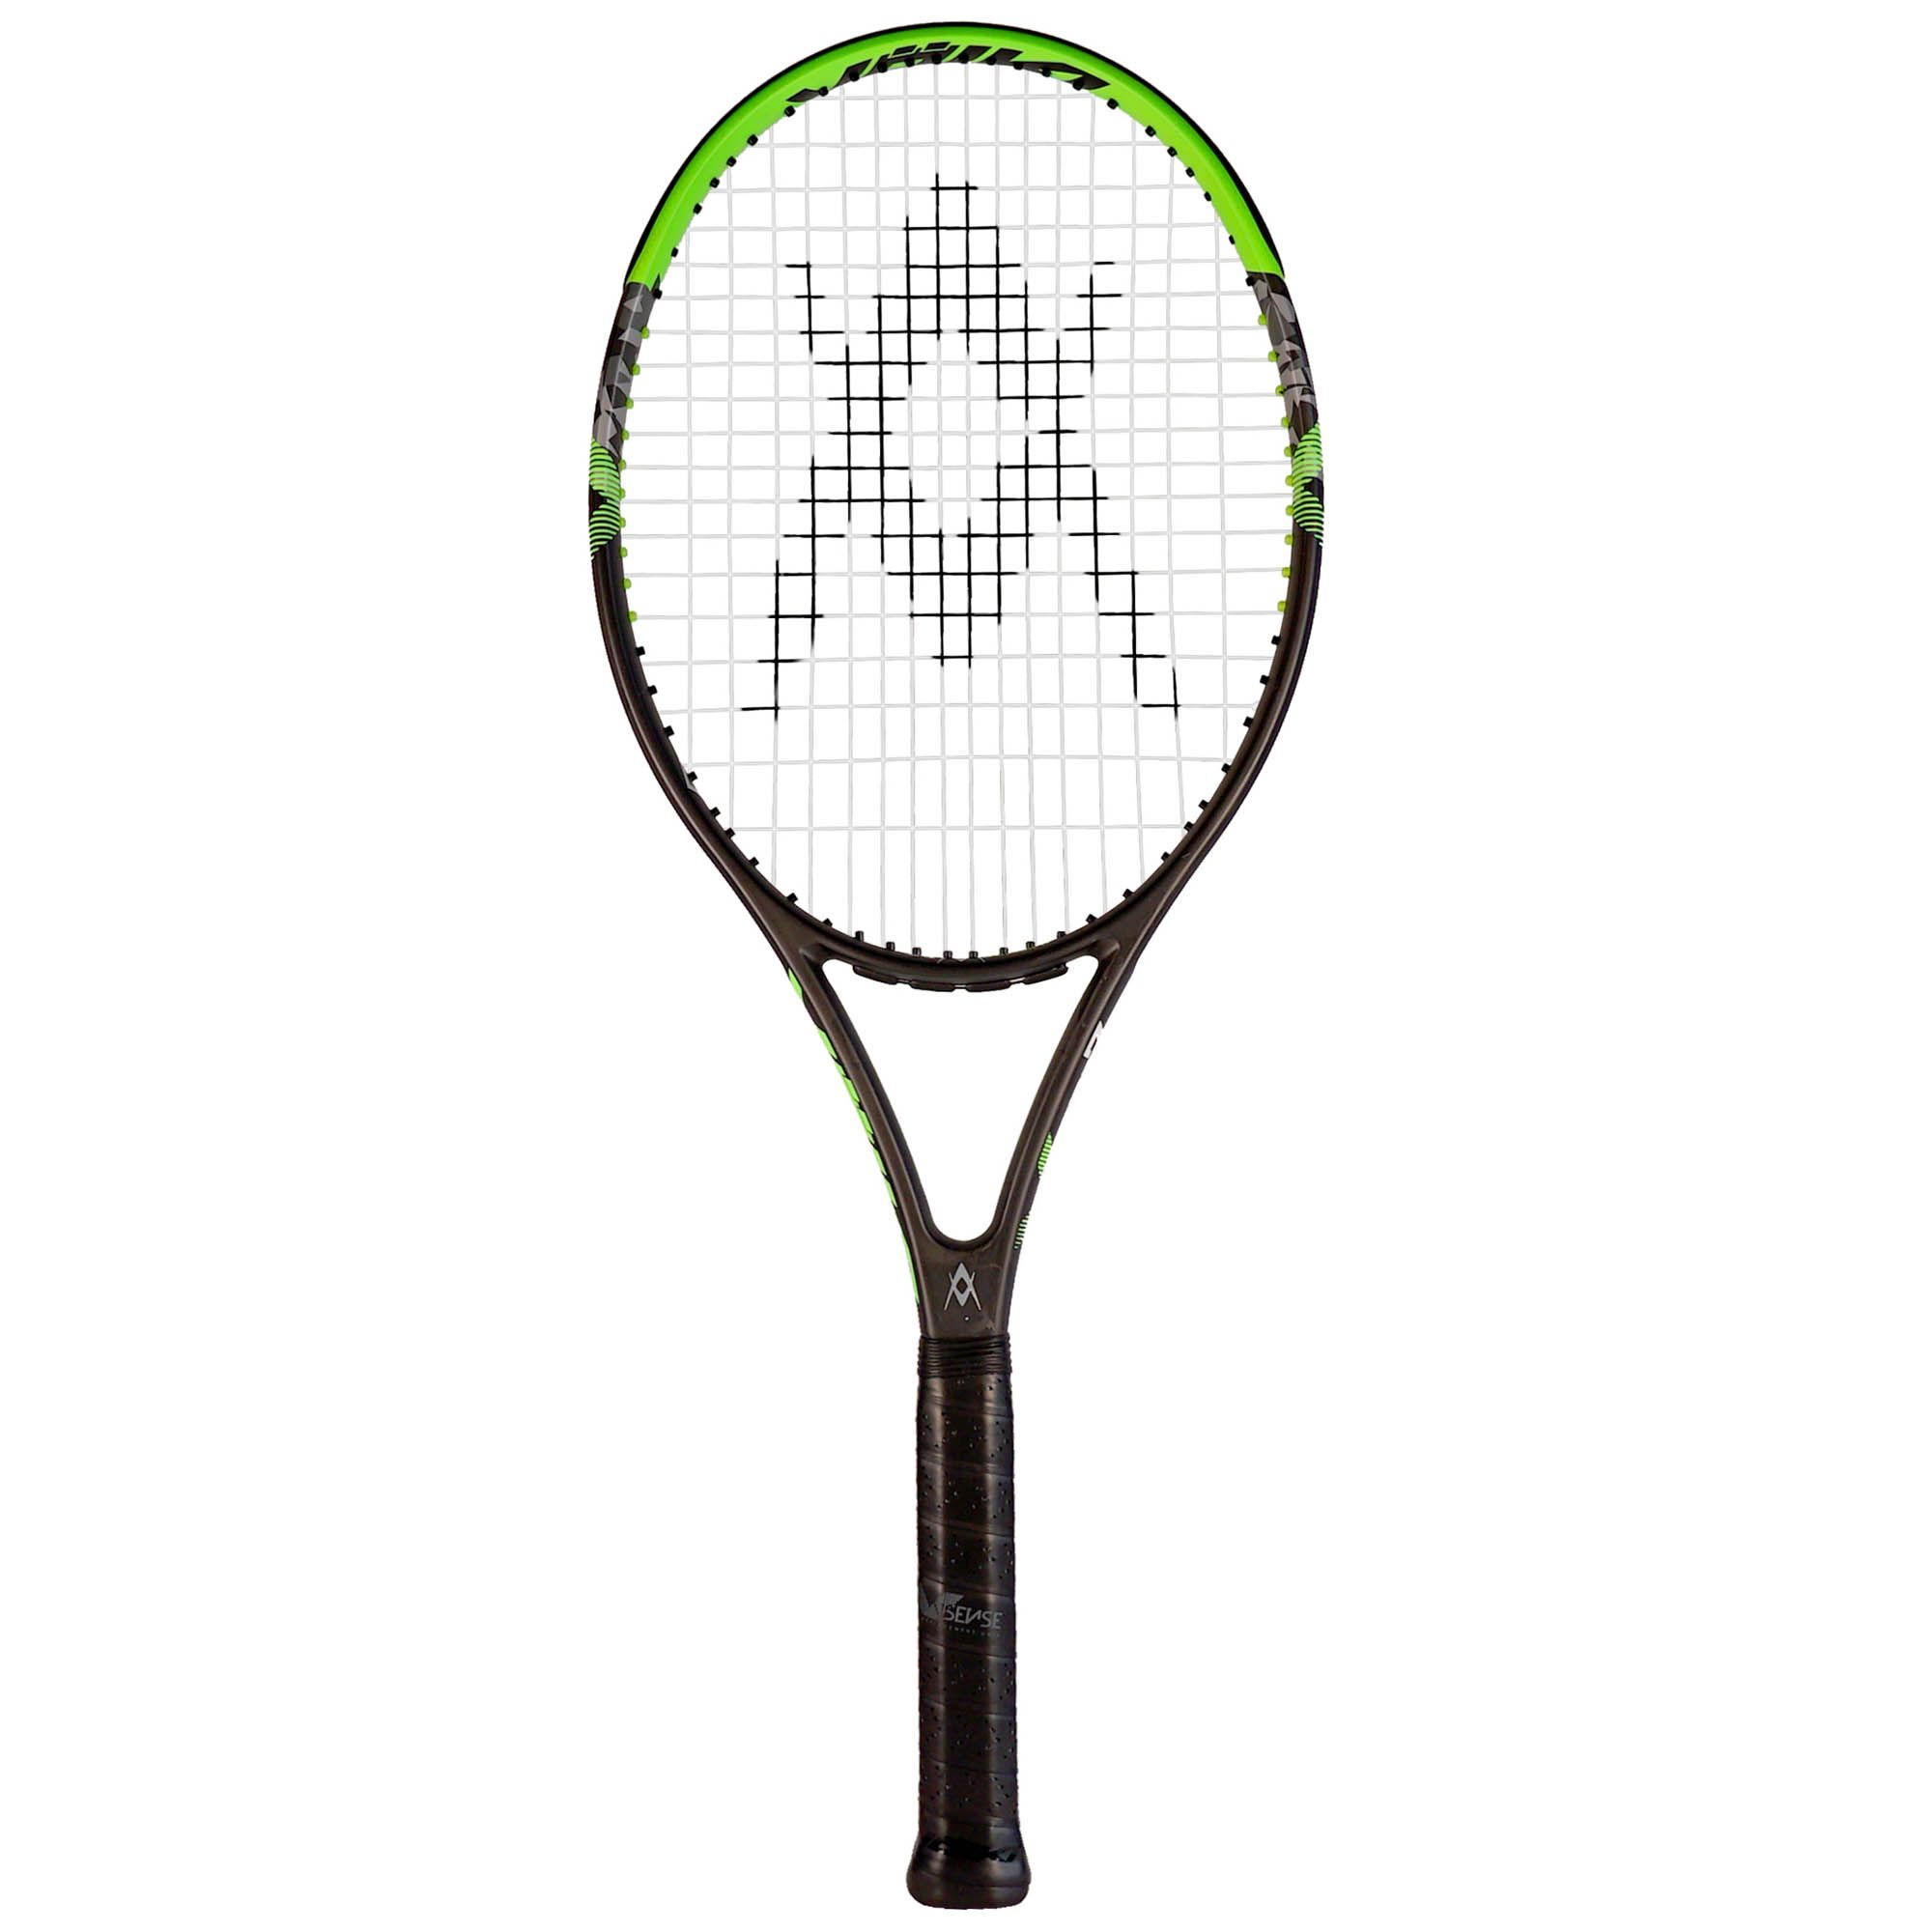 Volkl V-Sense 7 Tennis Racket